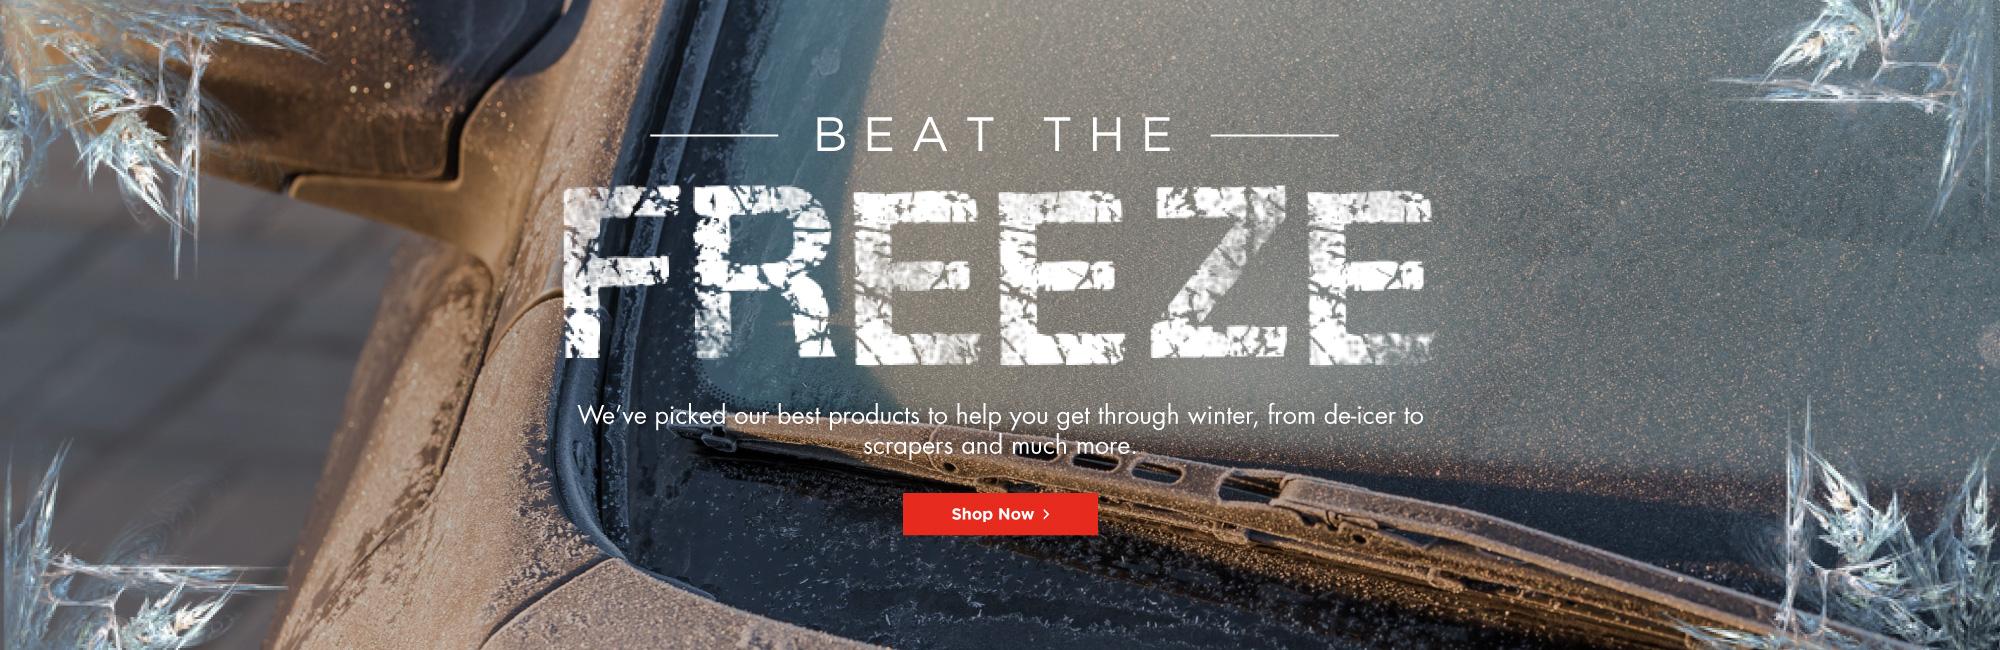 Beat the Freeze - Winter Essentials